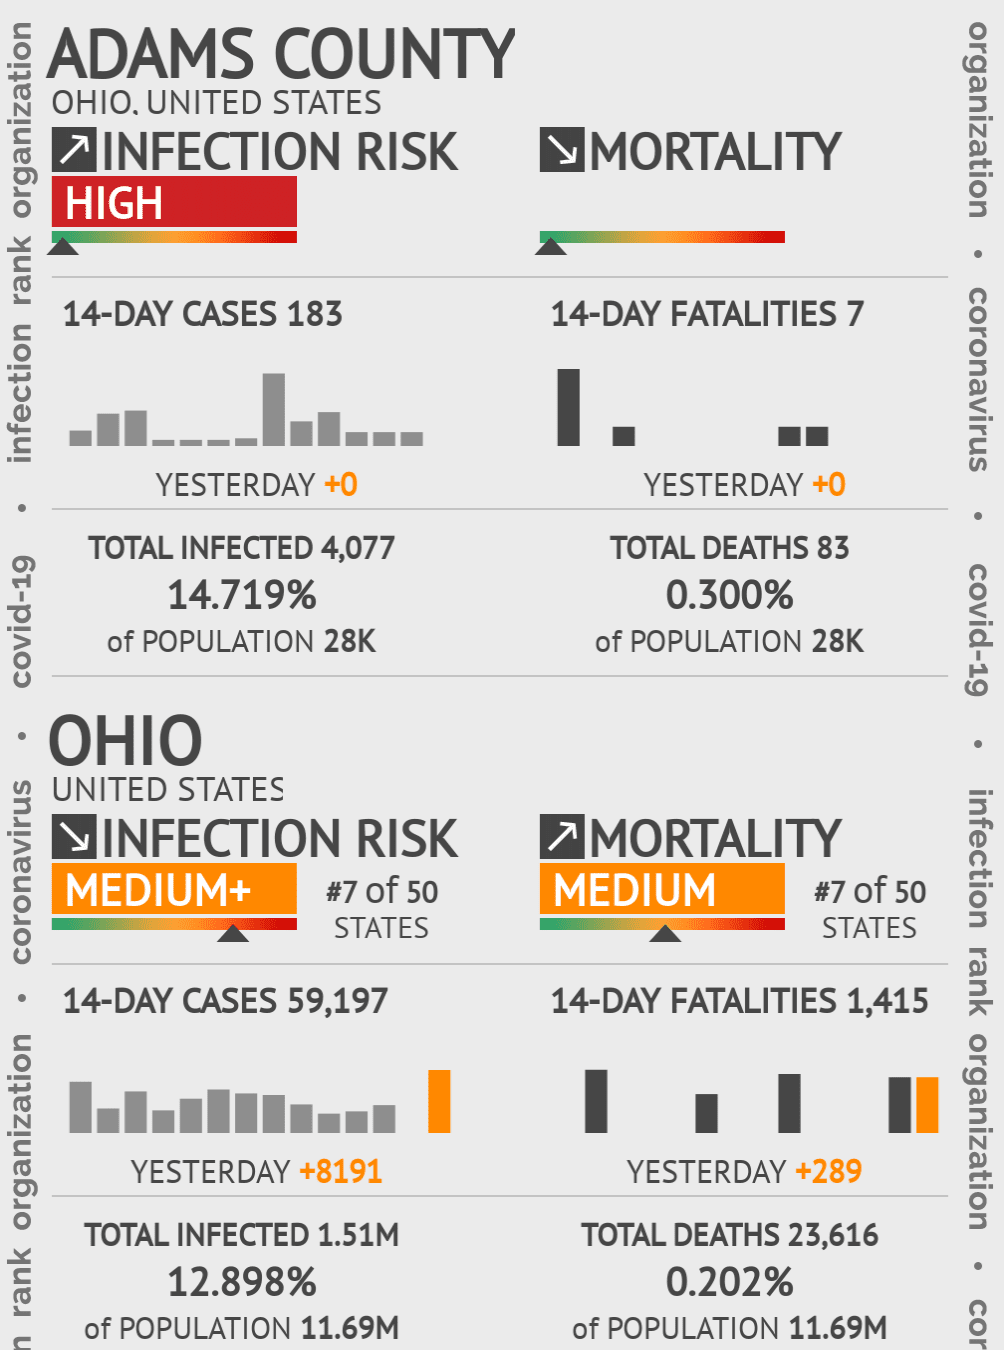 Adams County Coronavirus Covid-19 Risk of Infection on November 22, 2020